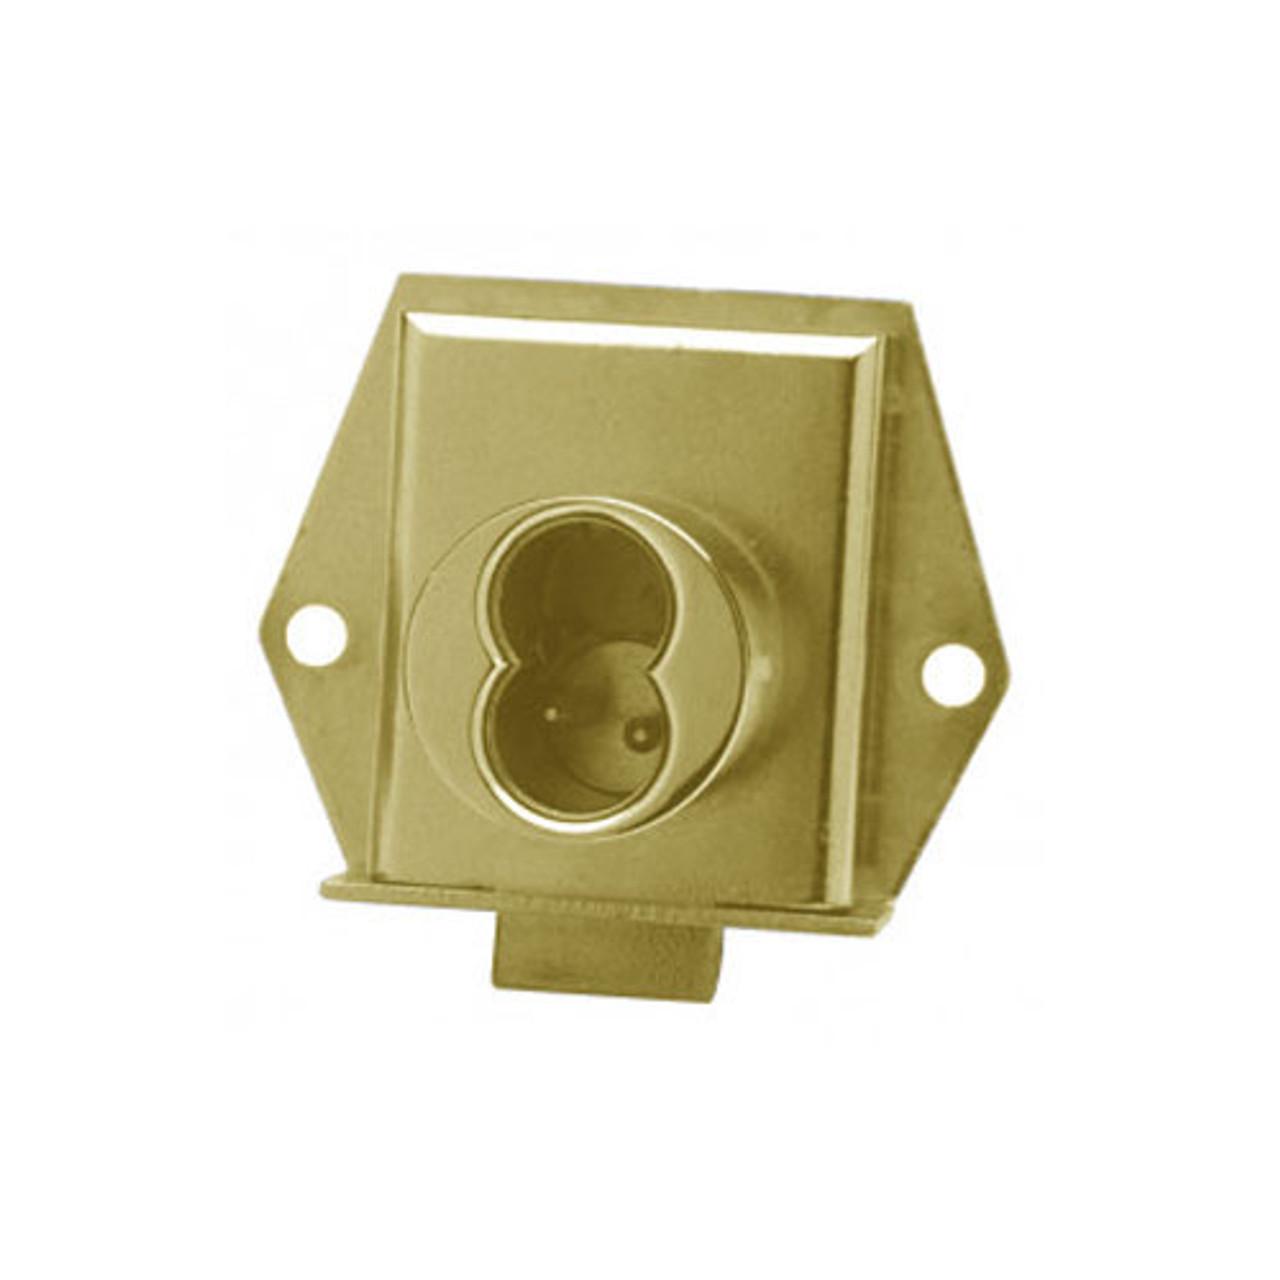 Olympus 725ML-DR-LH-US4 Cabinet Locks in Satin Brass Finish